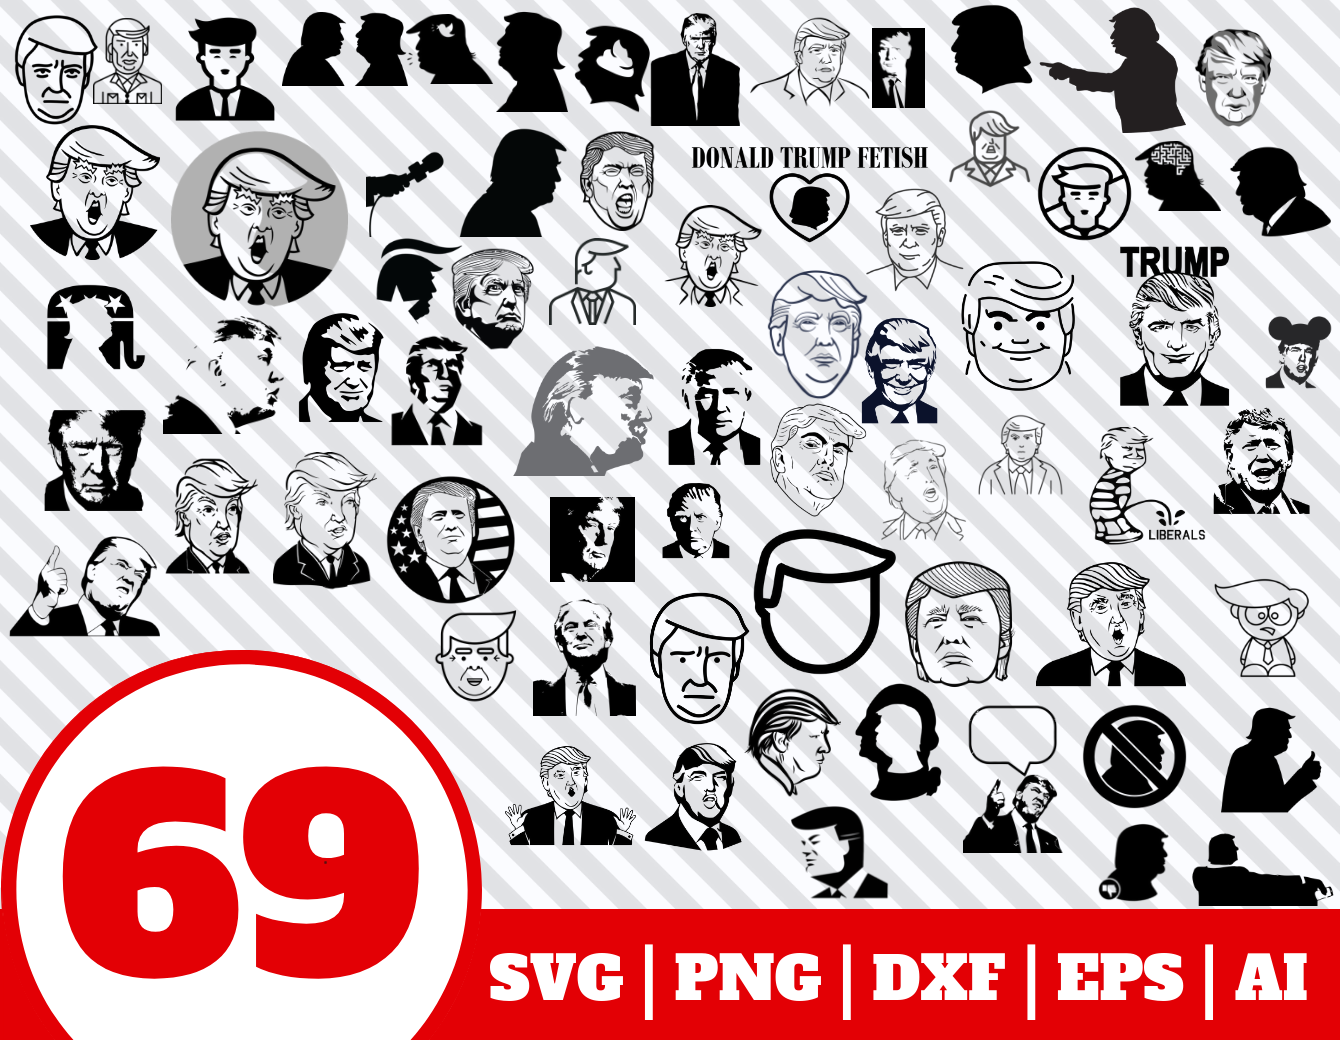 donald trump svg #123, Download drawings